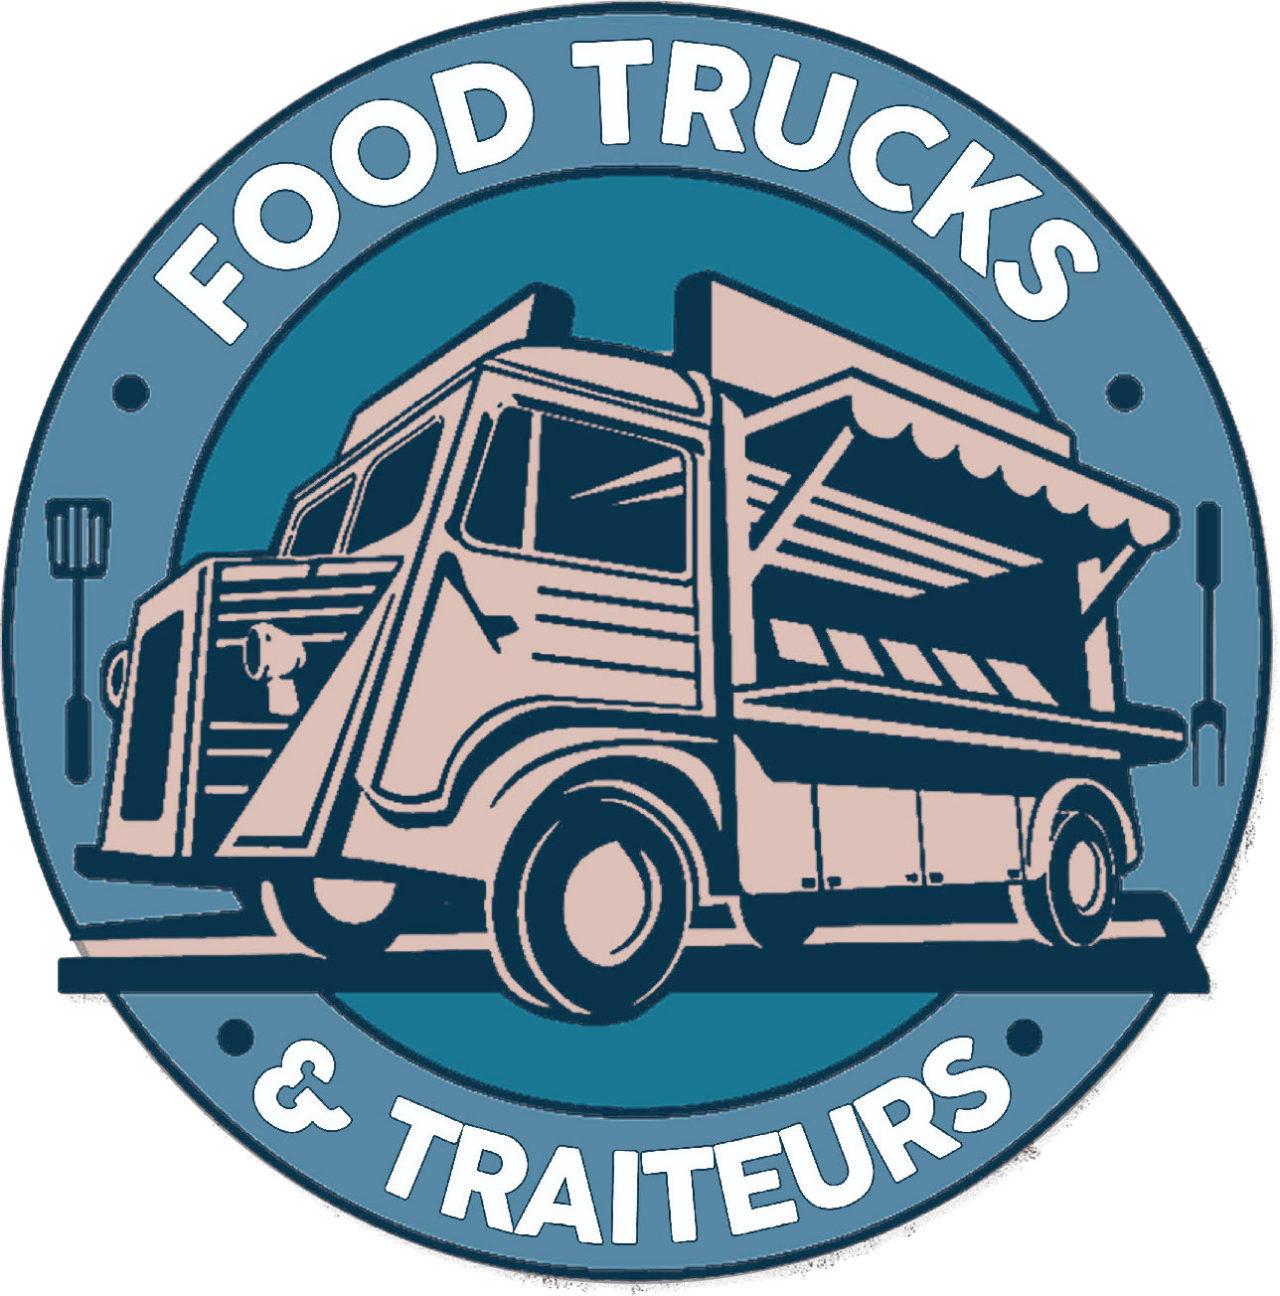 https://lafabriquedesgros.fr/wp-content/uploads/2018/09/food_truck_logo-1280x1296.jpg